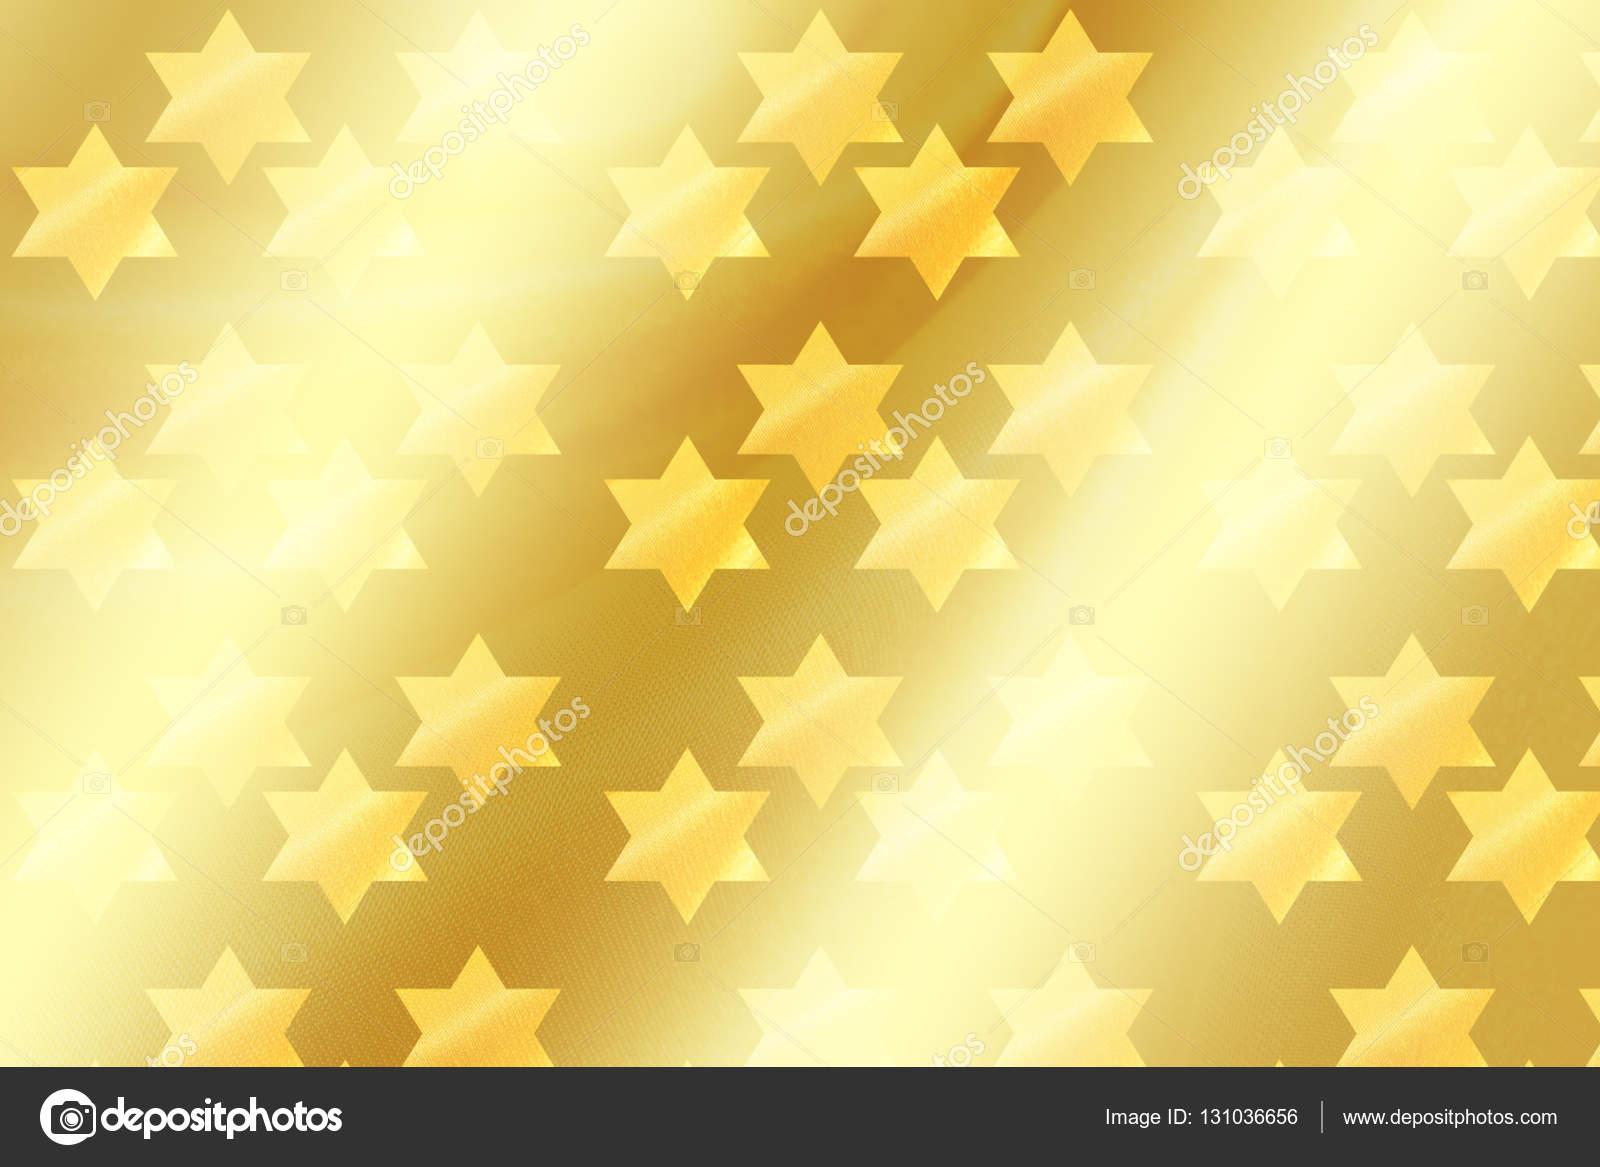 Star of David background. David stars banner. Jewish Holiday stars. Gold stars wallpaper